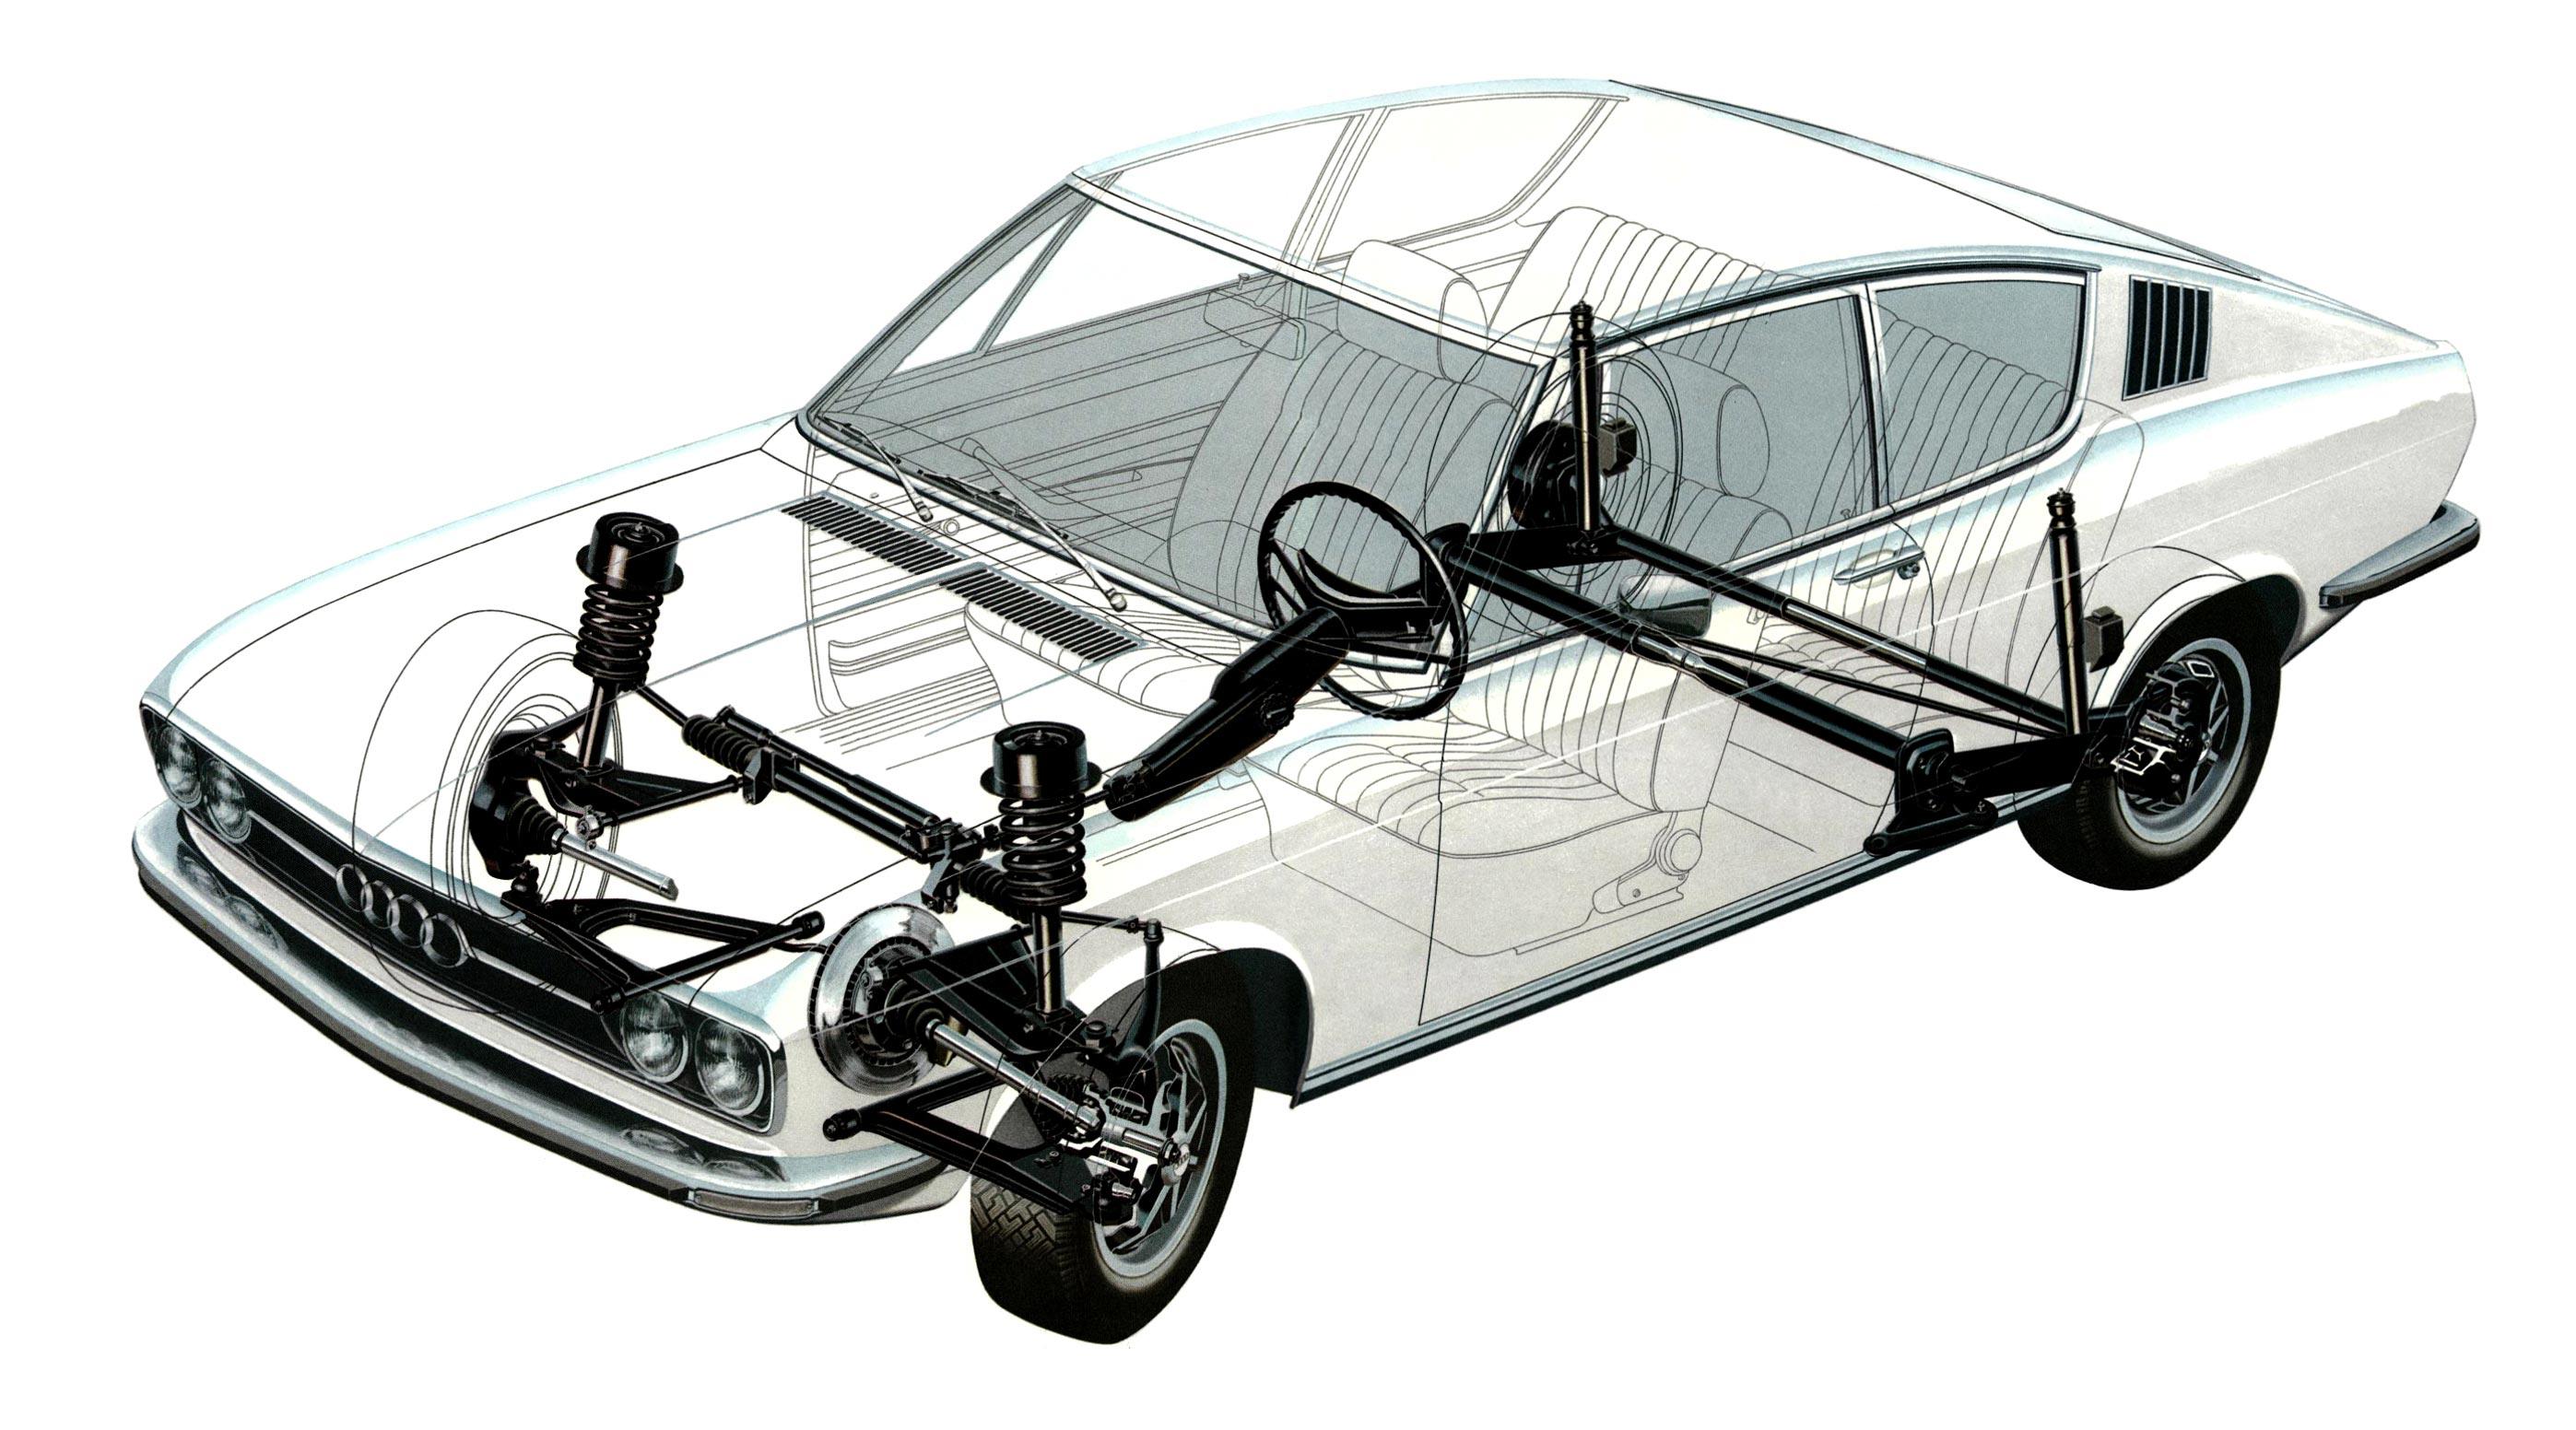 Audi 100 Coupe cutaway drawing